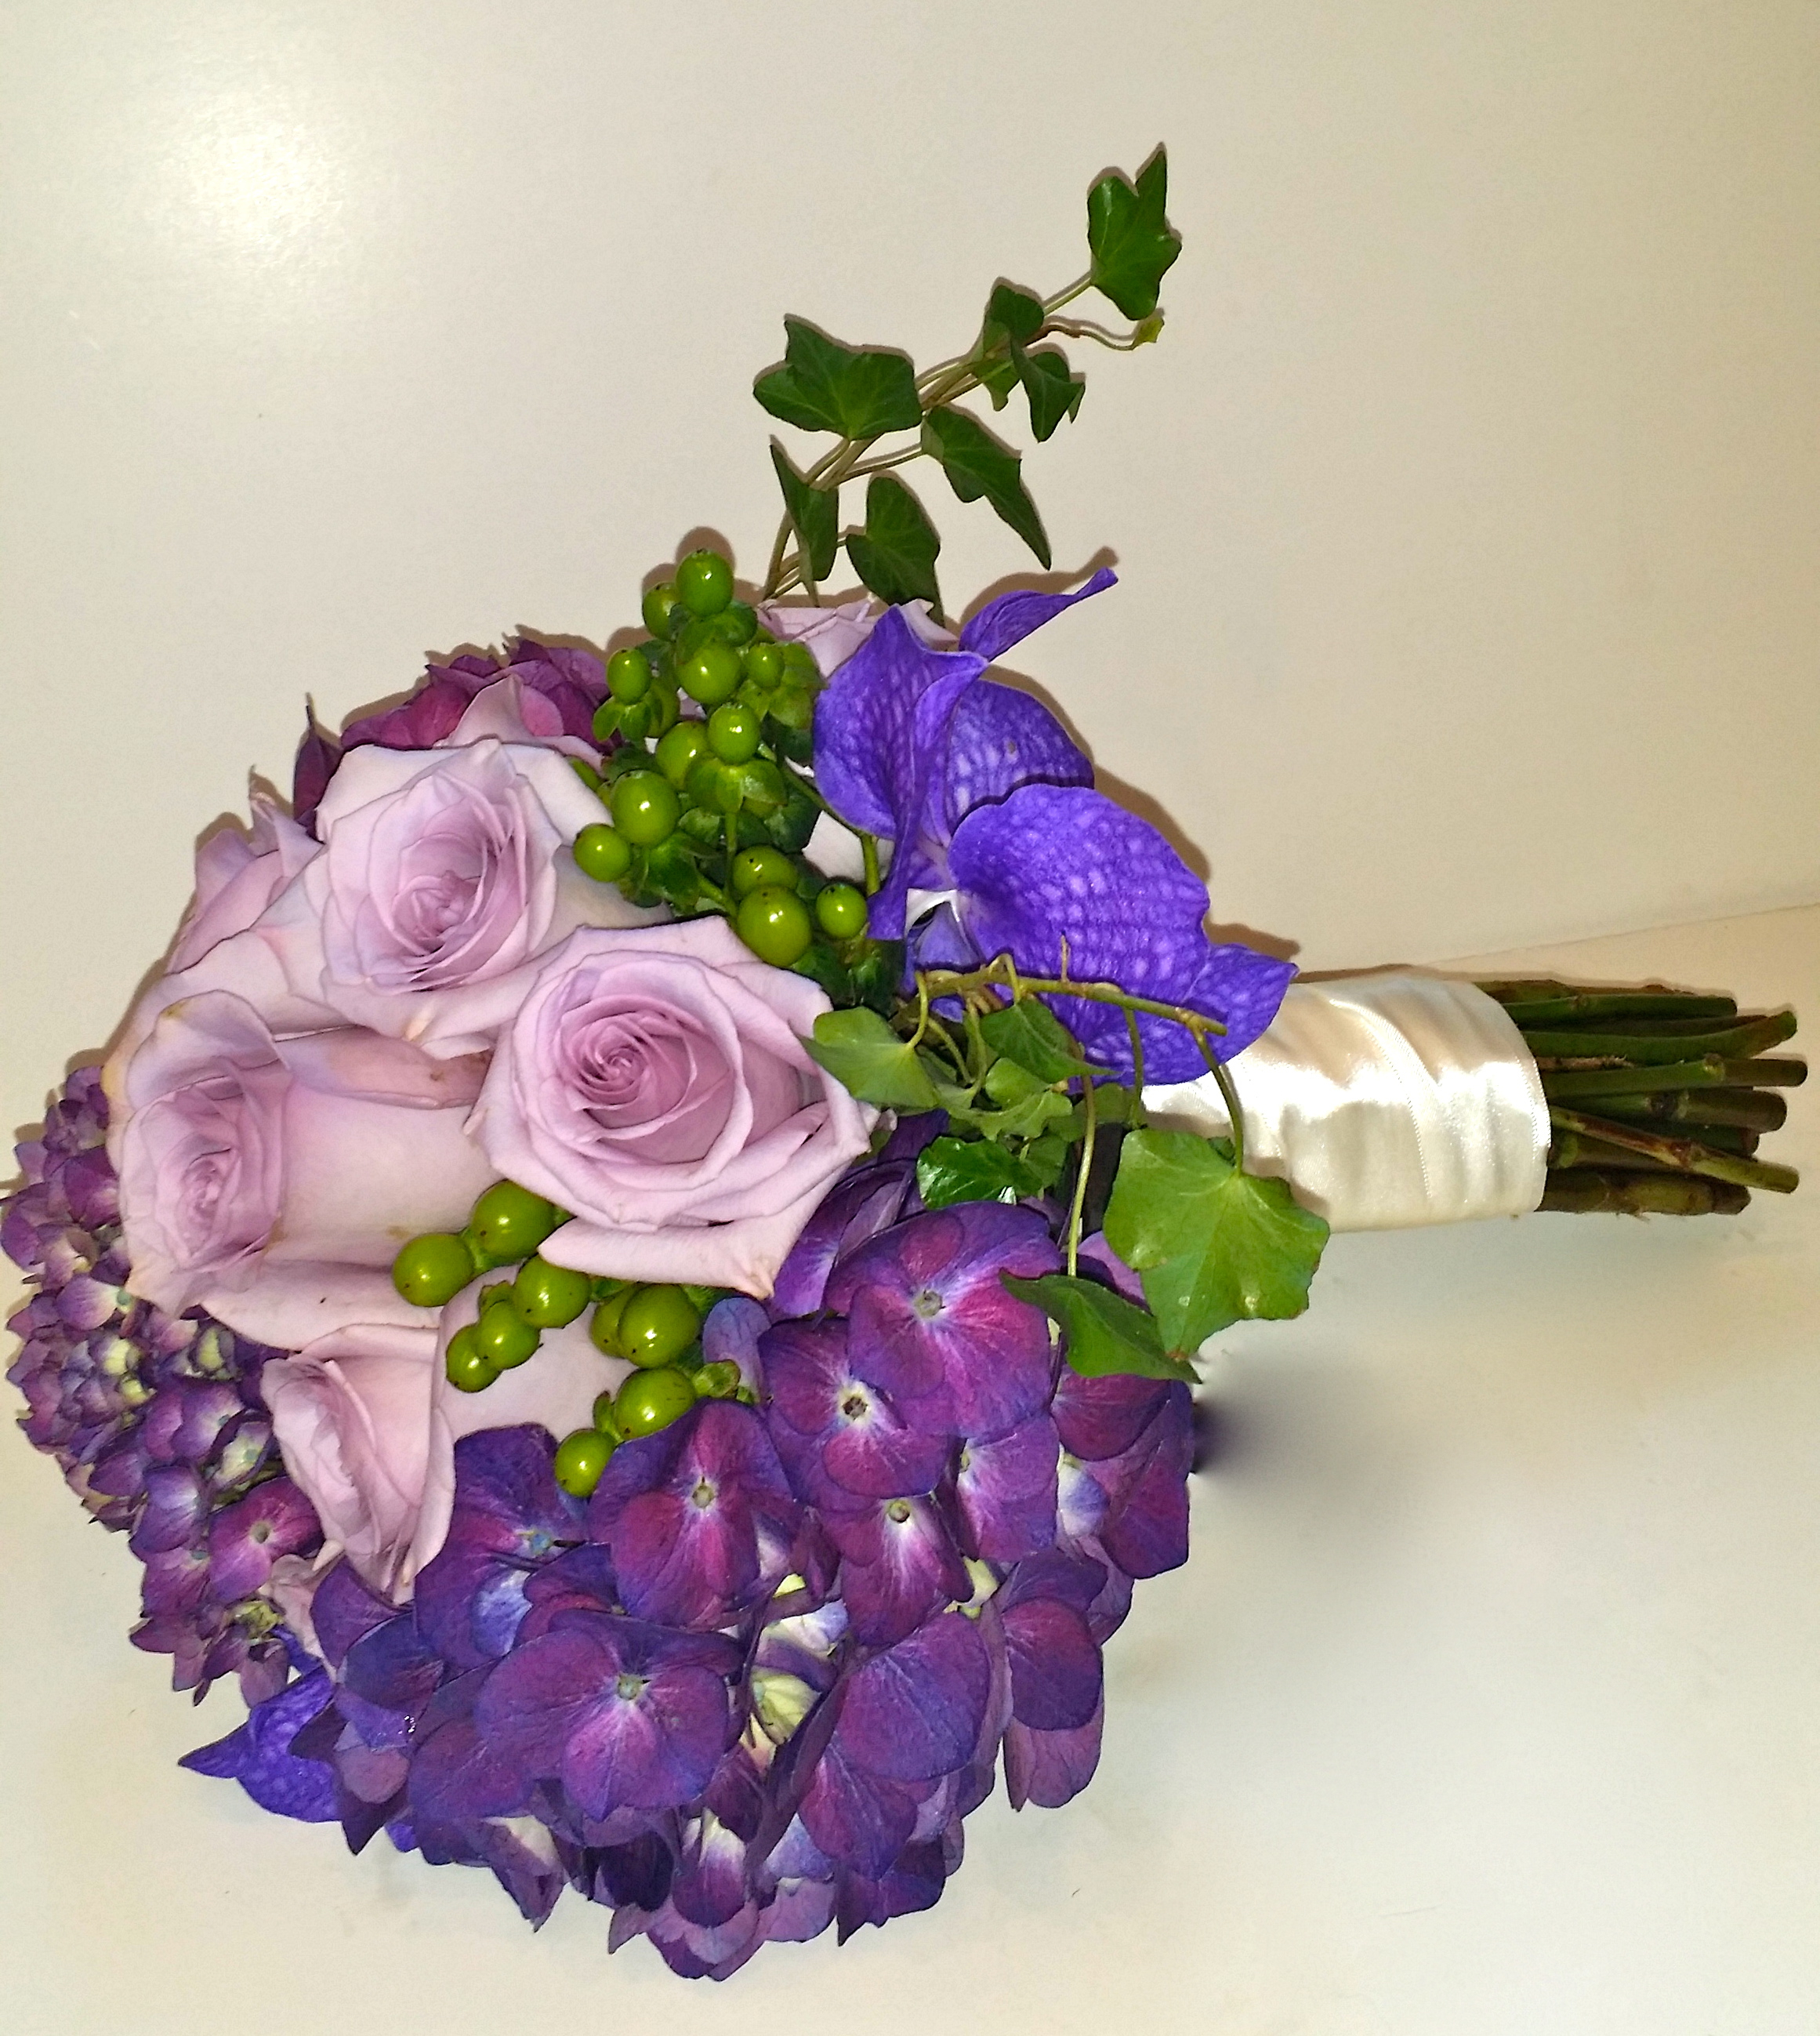 Ocean Song Rose, Vendetta Orchid, Hydrangea, Hypericum -